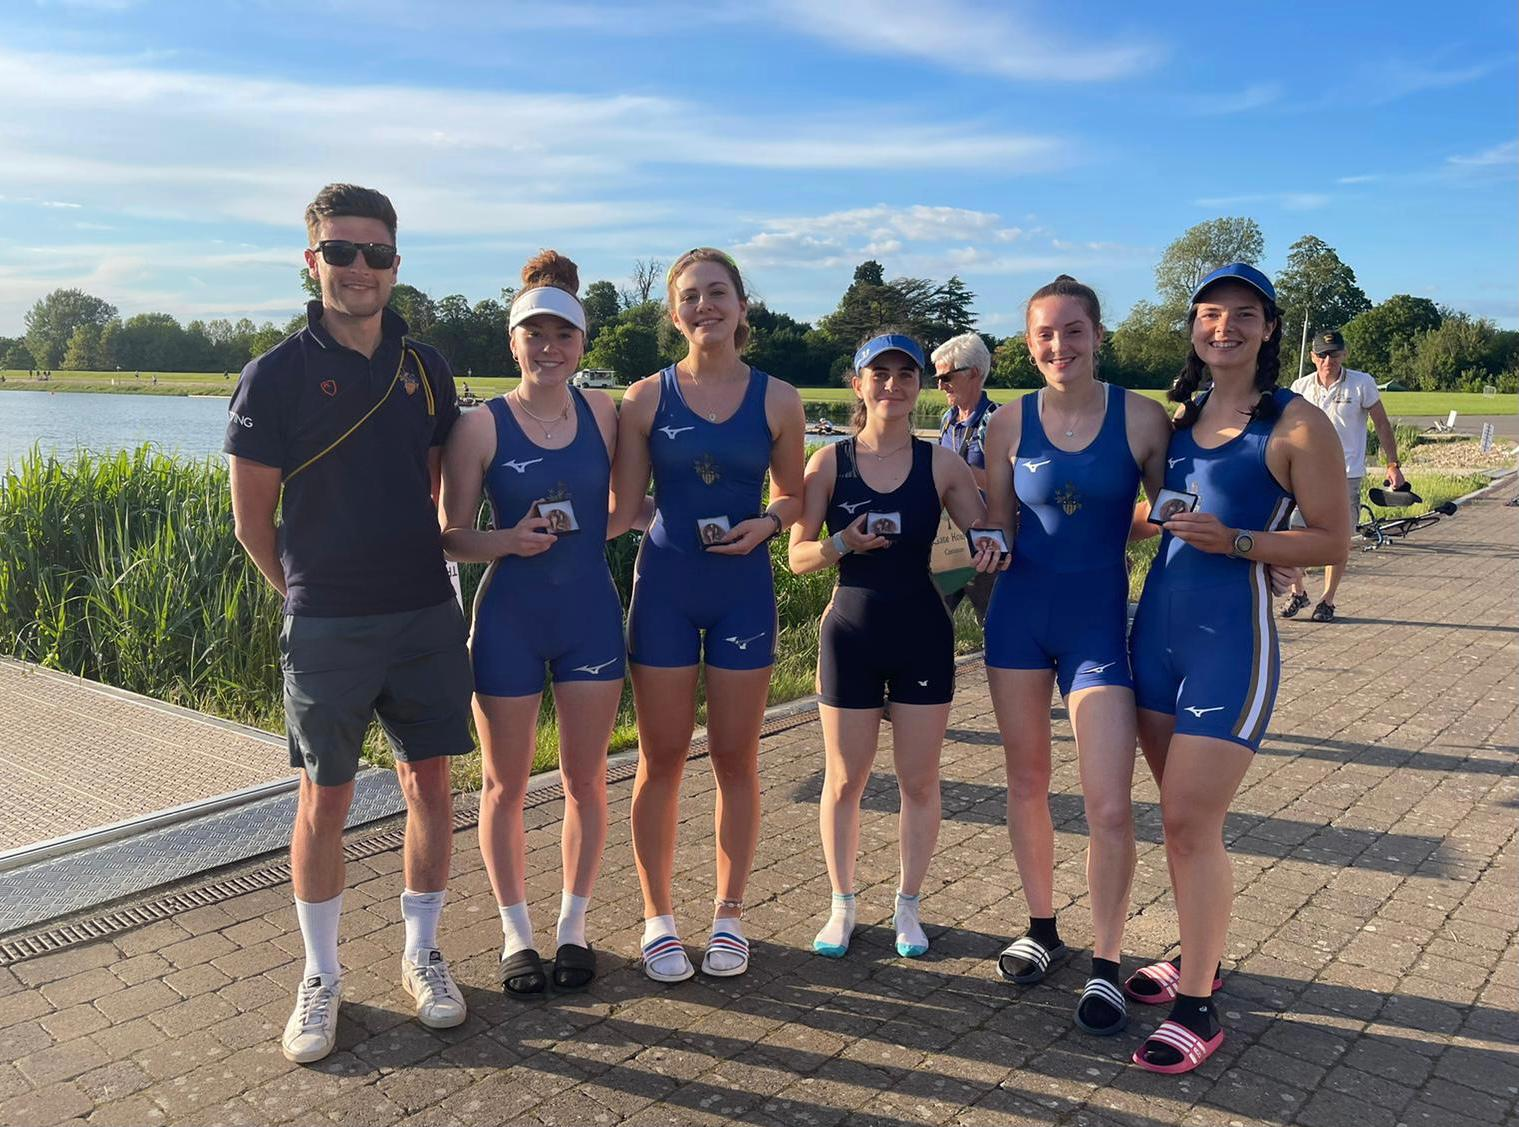 Women's Four Winning MET Regatta